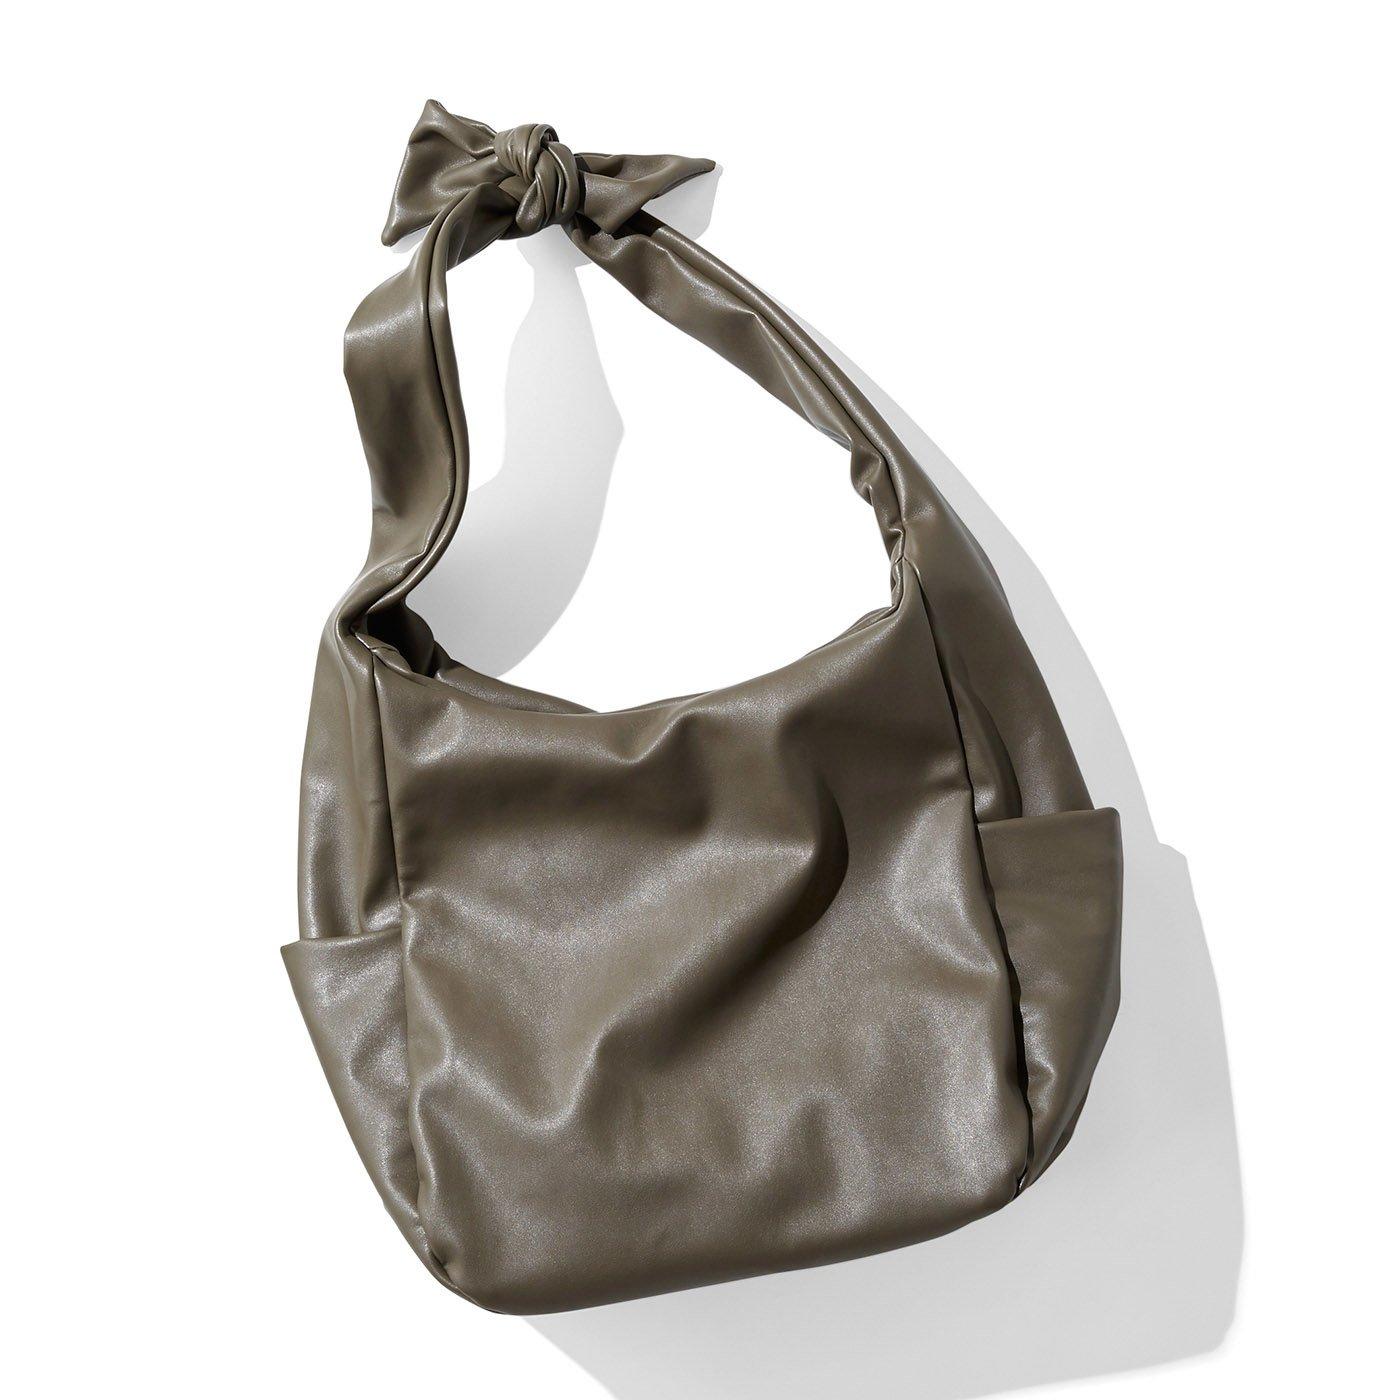 IEDIT 布派も認定! 布バッグみたいに気軽に持てるライトフェイクレザーバッグ〈グレージュ〉